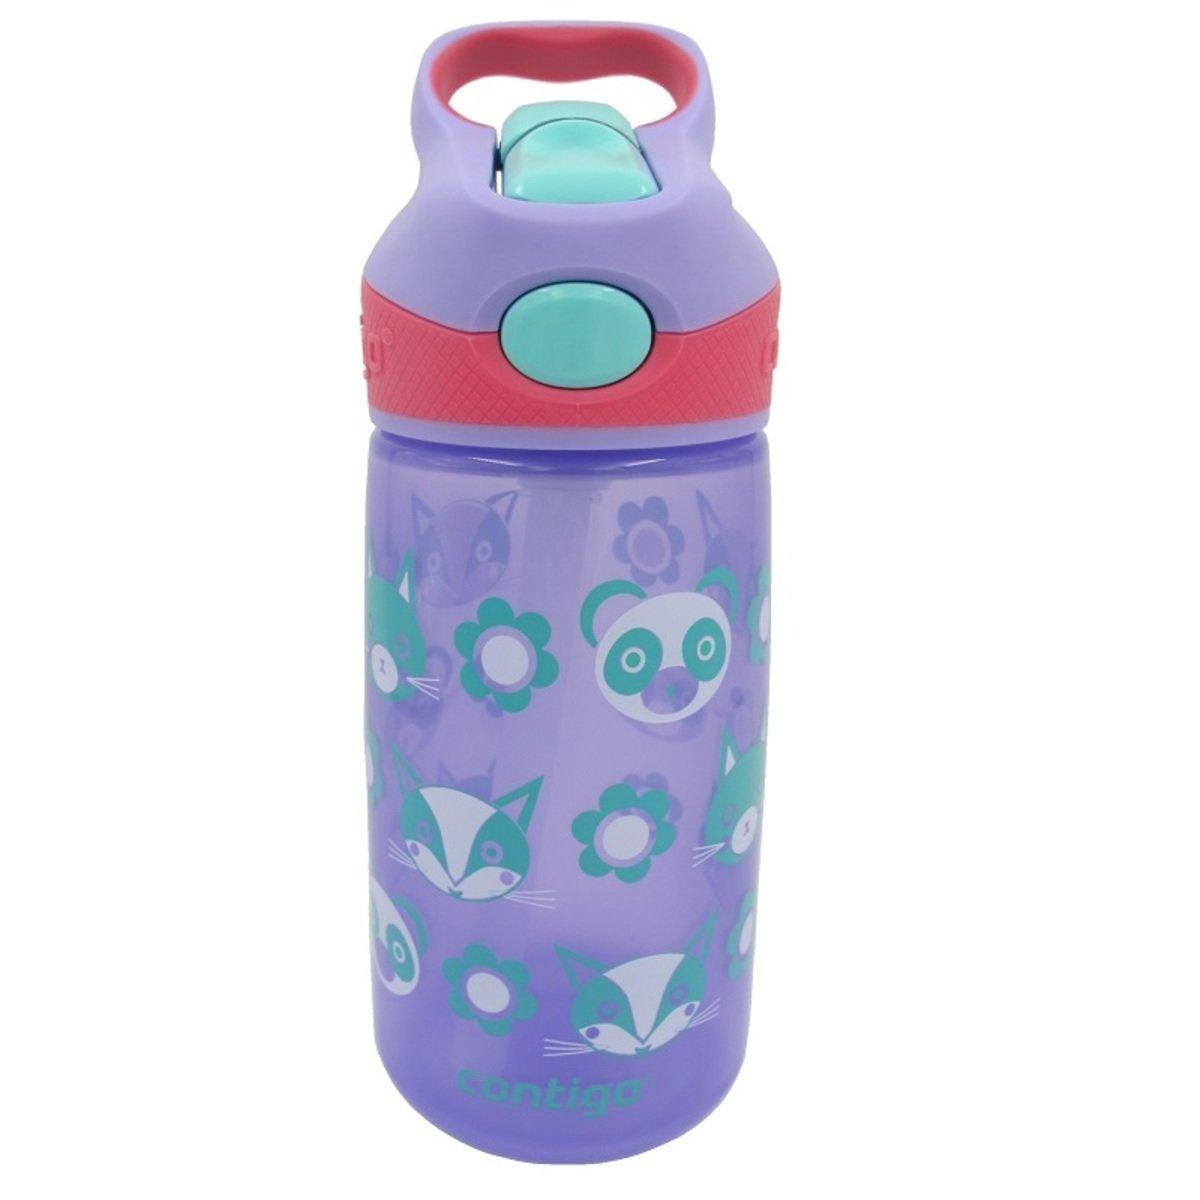 Striker 兒童自動吸管杯 - 小動物